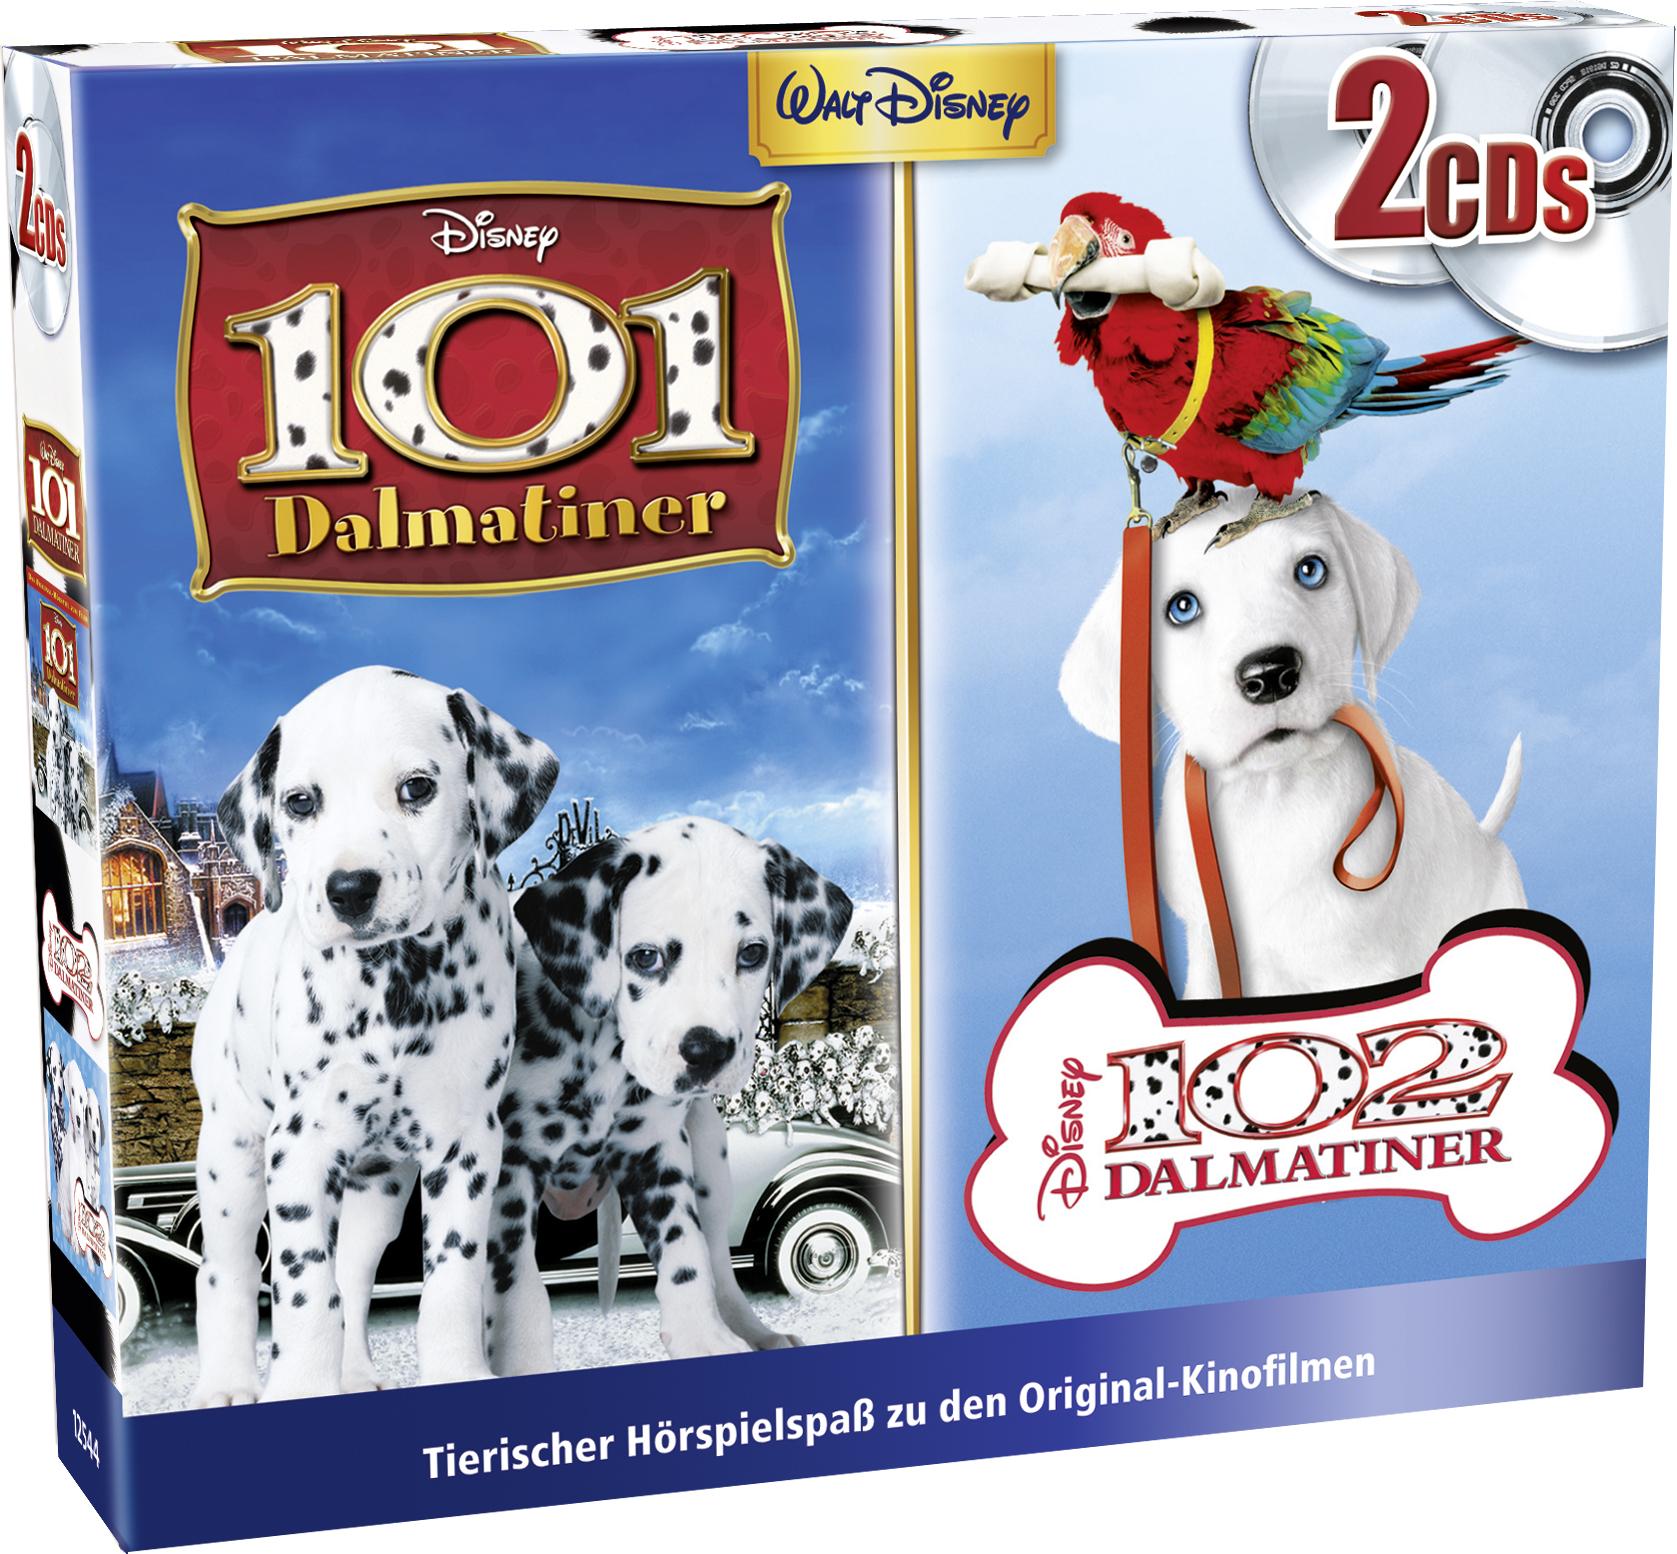 Disney: 2er CD-Box (101 & 102 Dalmatiner)